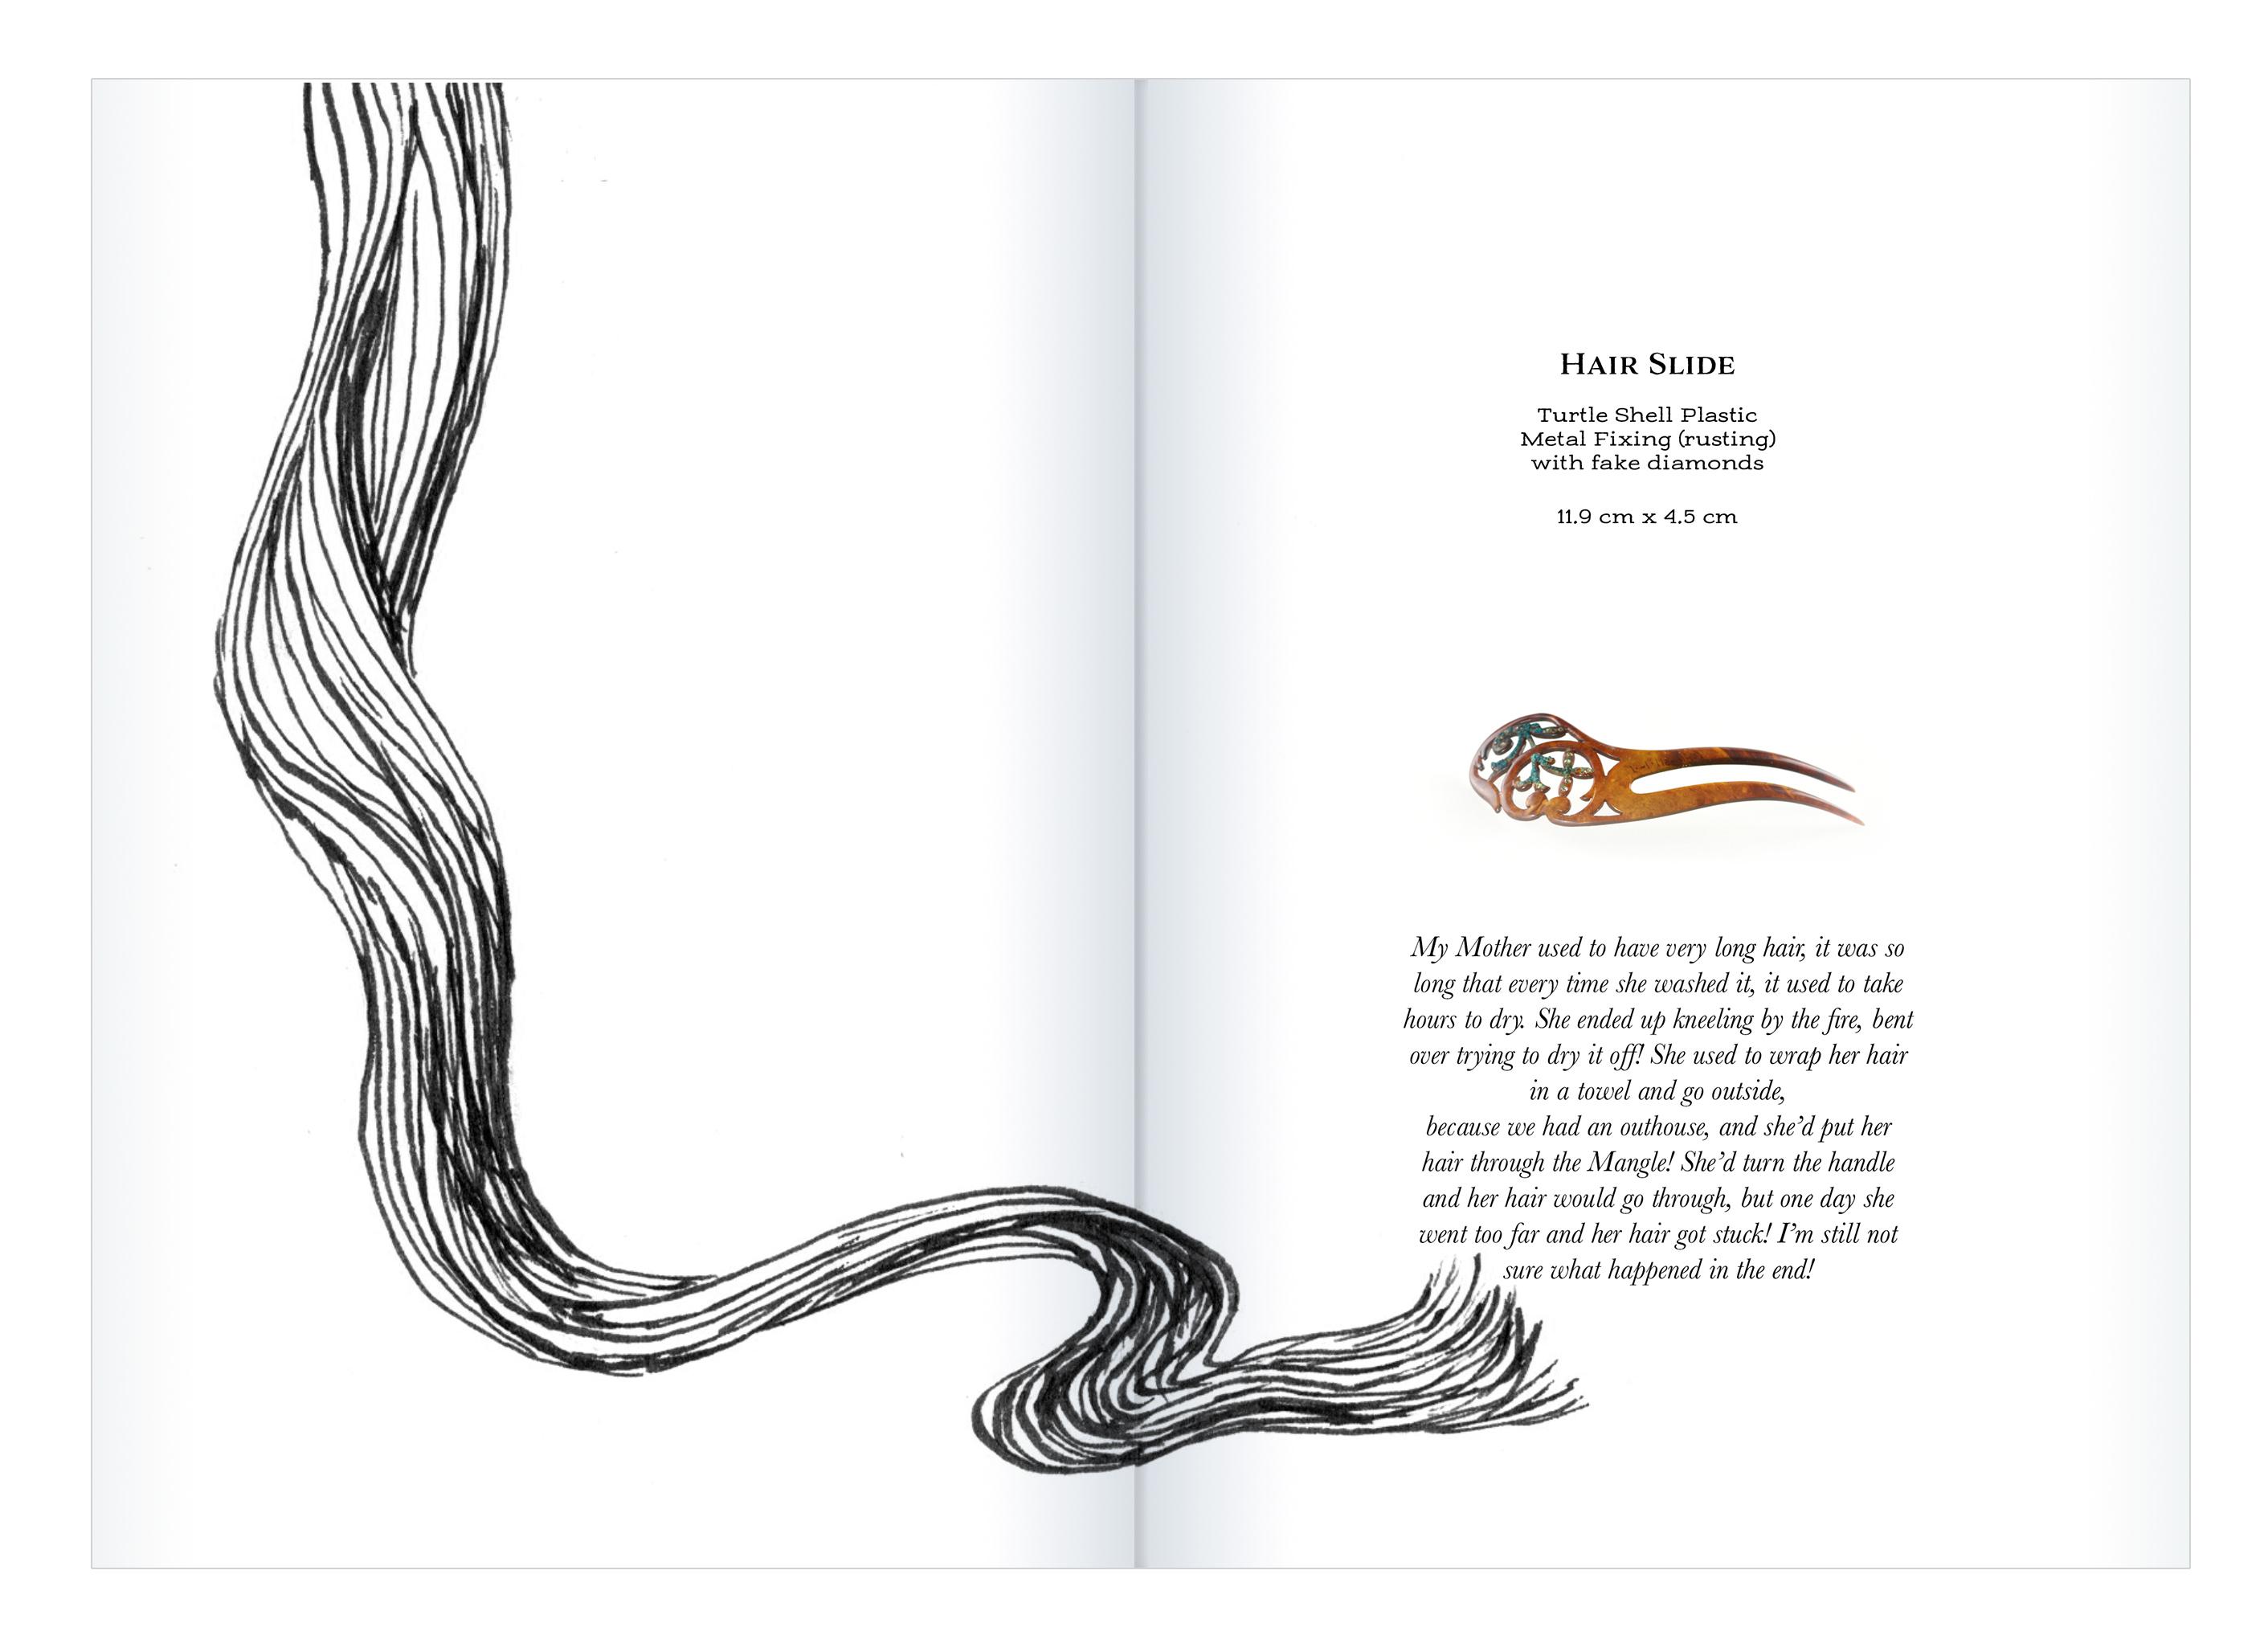 Claire Marchant - Memories Book